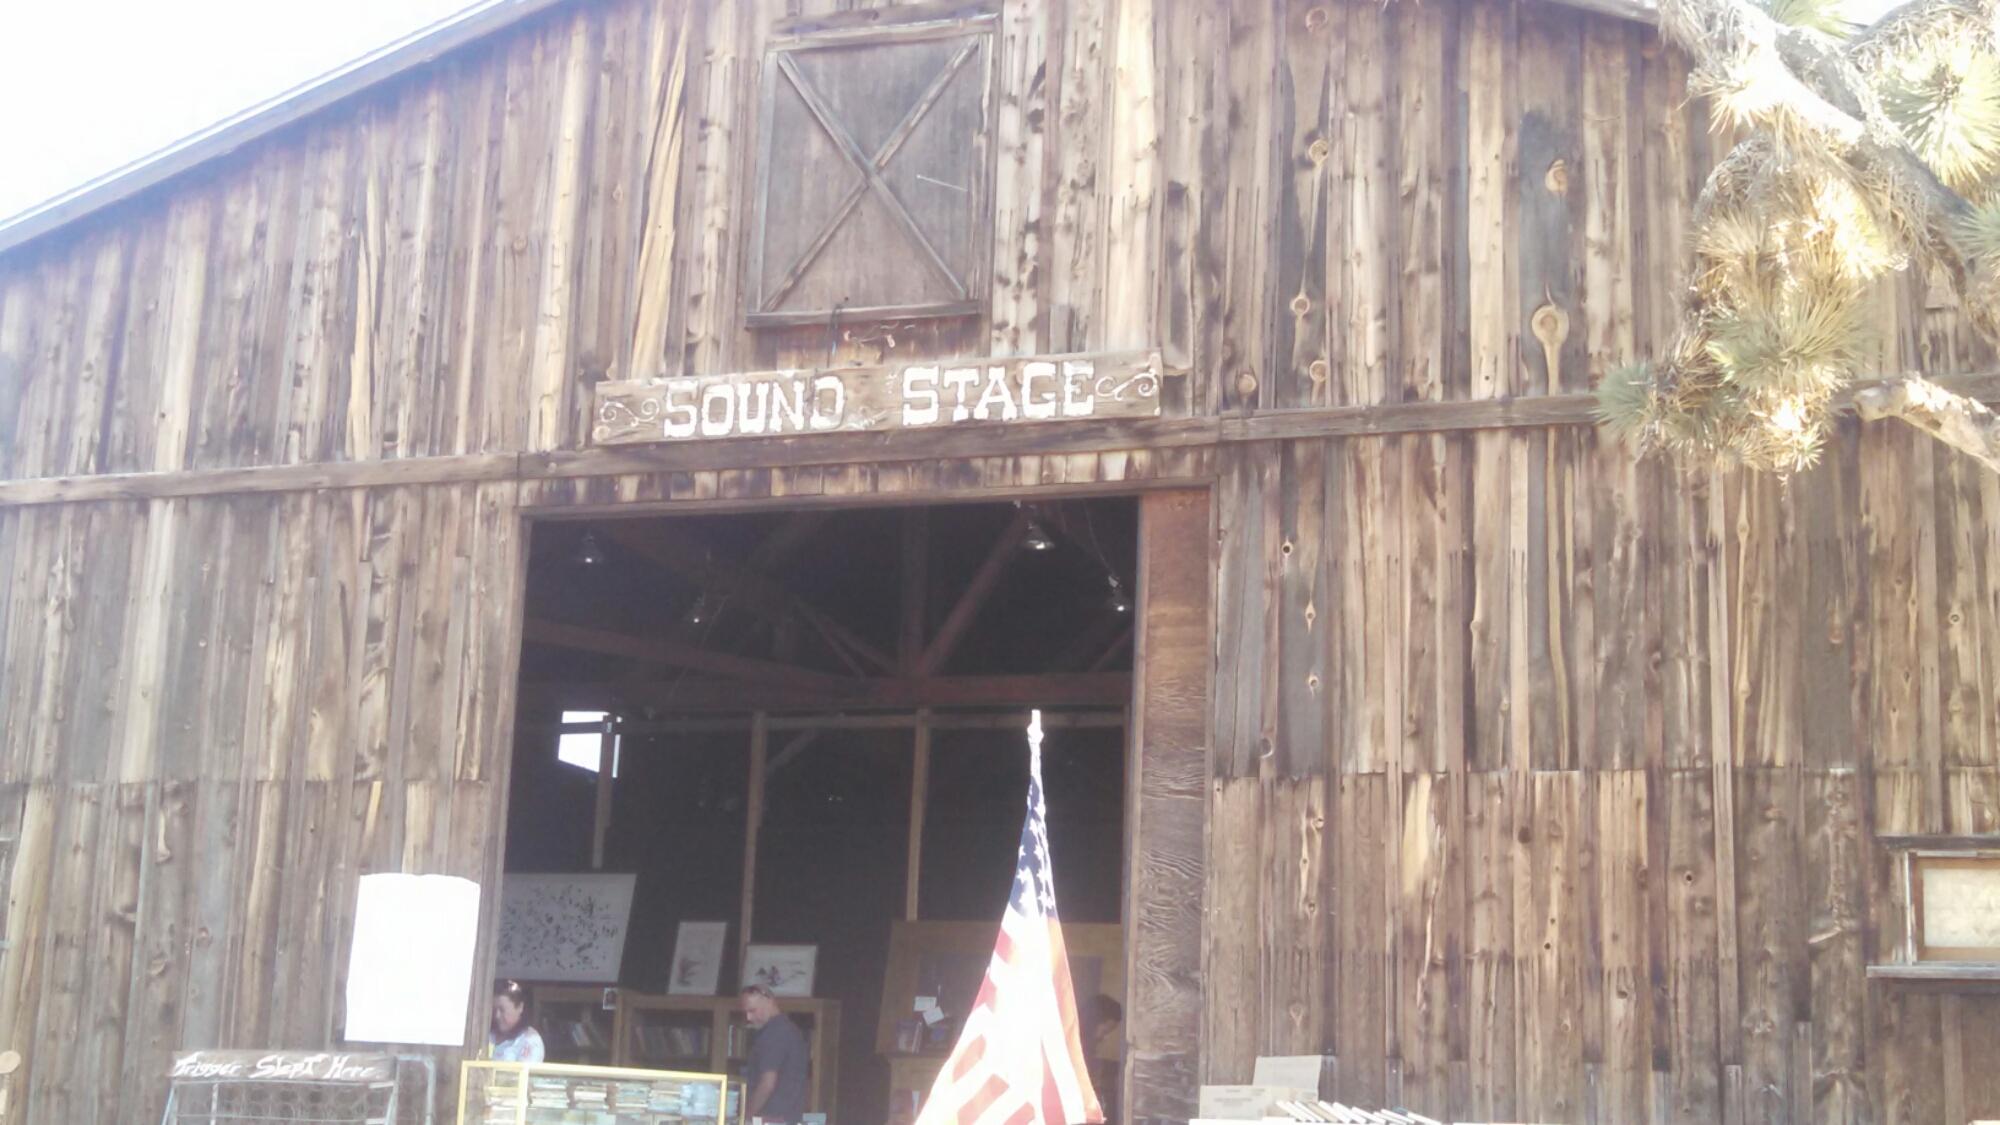 wpid wp 1427040415522 - LFTR - US - CA - Roadside oddities make me happy. Giant Rock, Integratron, Pioneer town